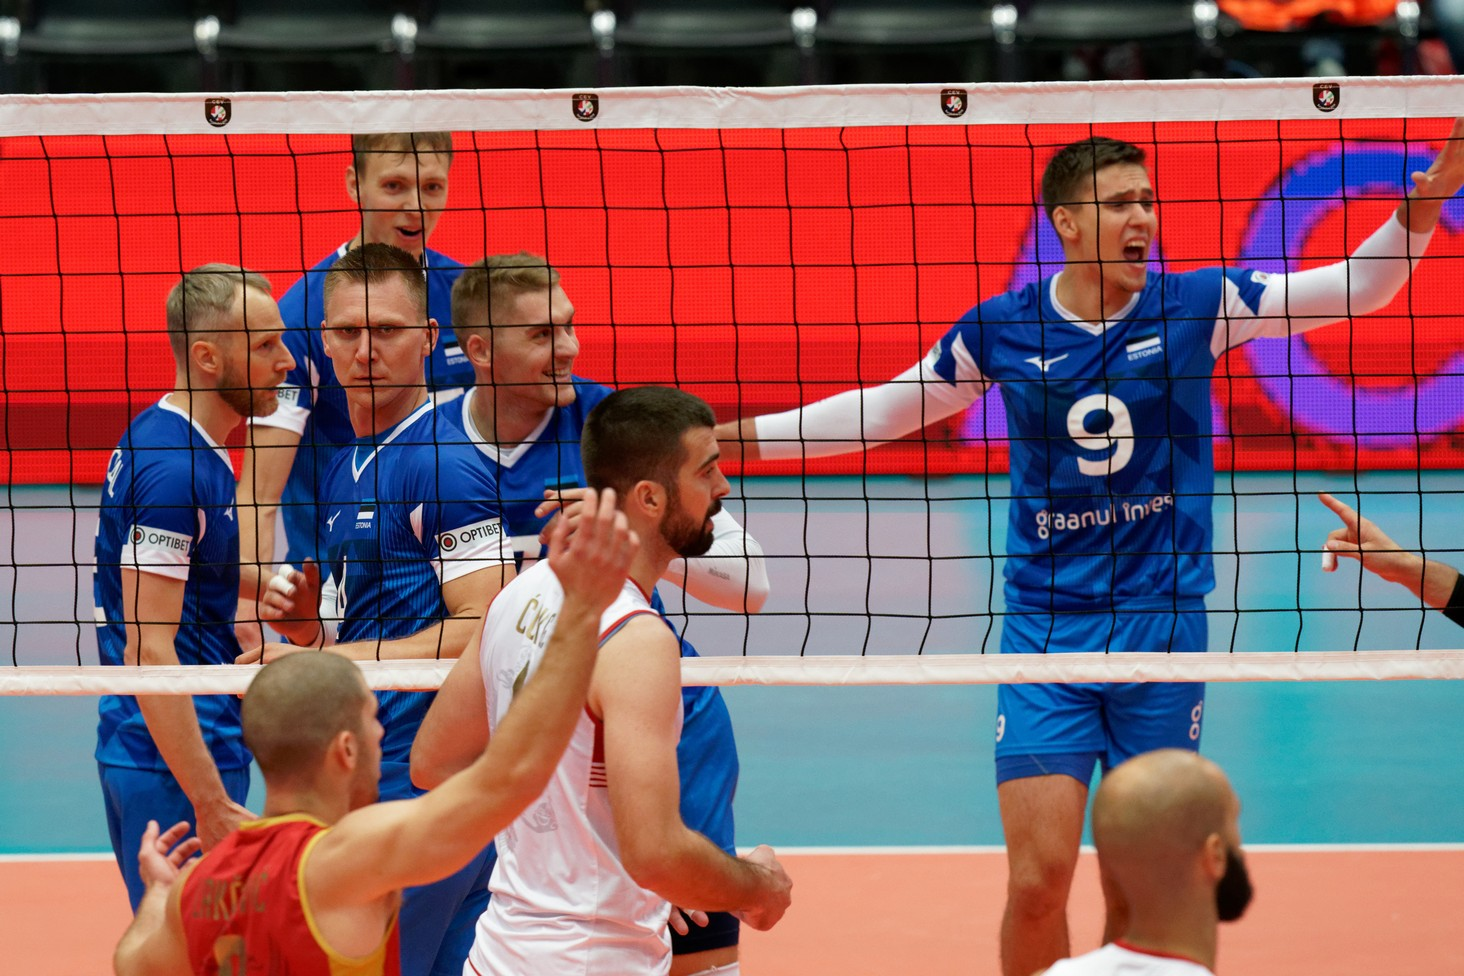 crna gora estonija seniori reprezentacija odbojkasi evropsko prvenstvo 016